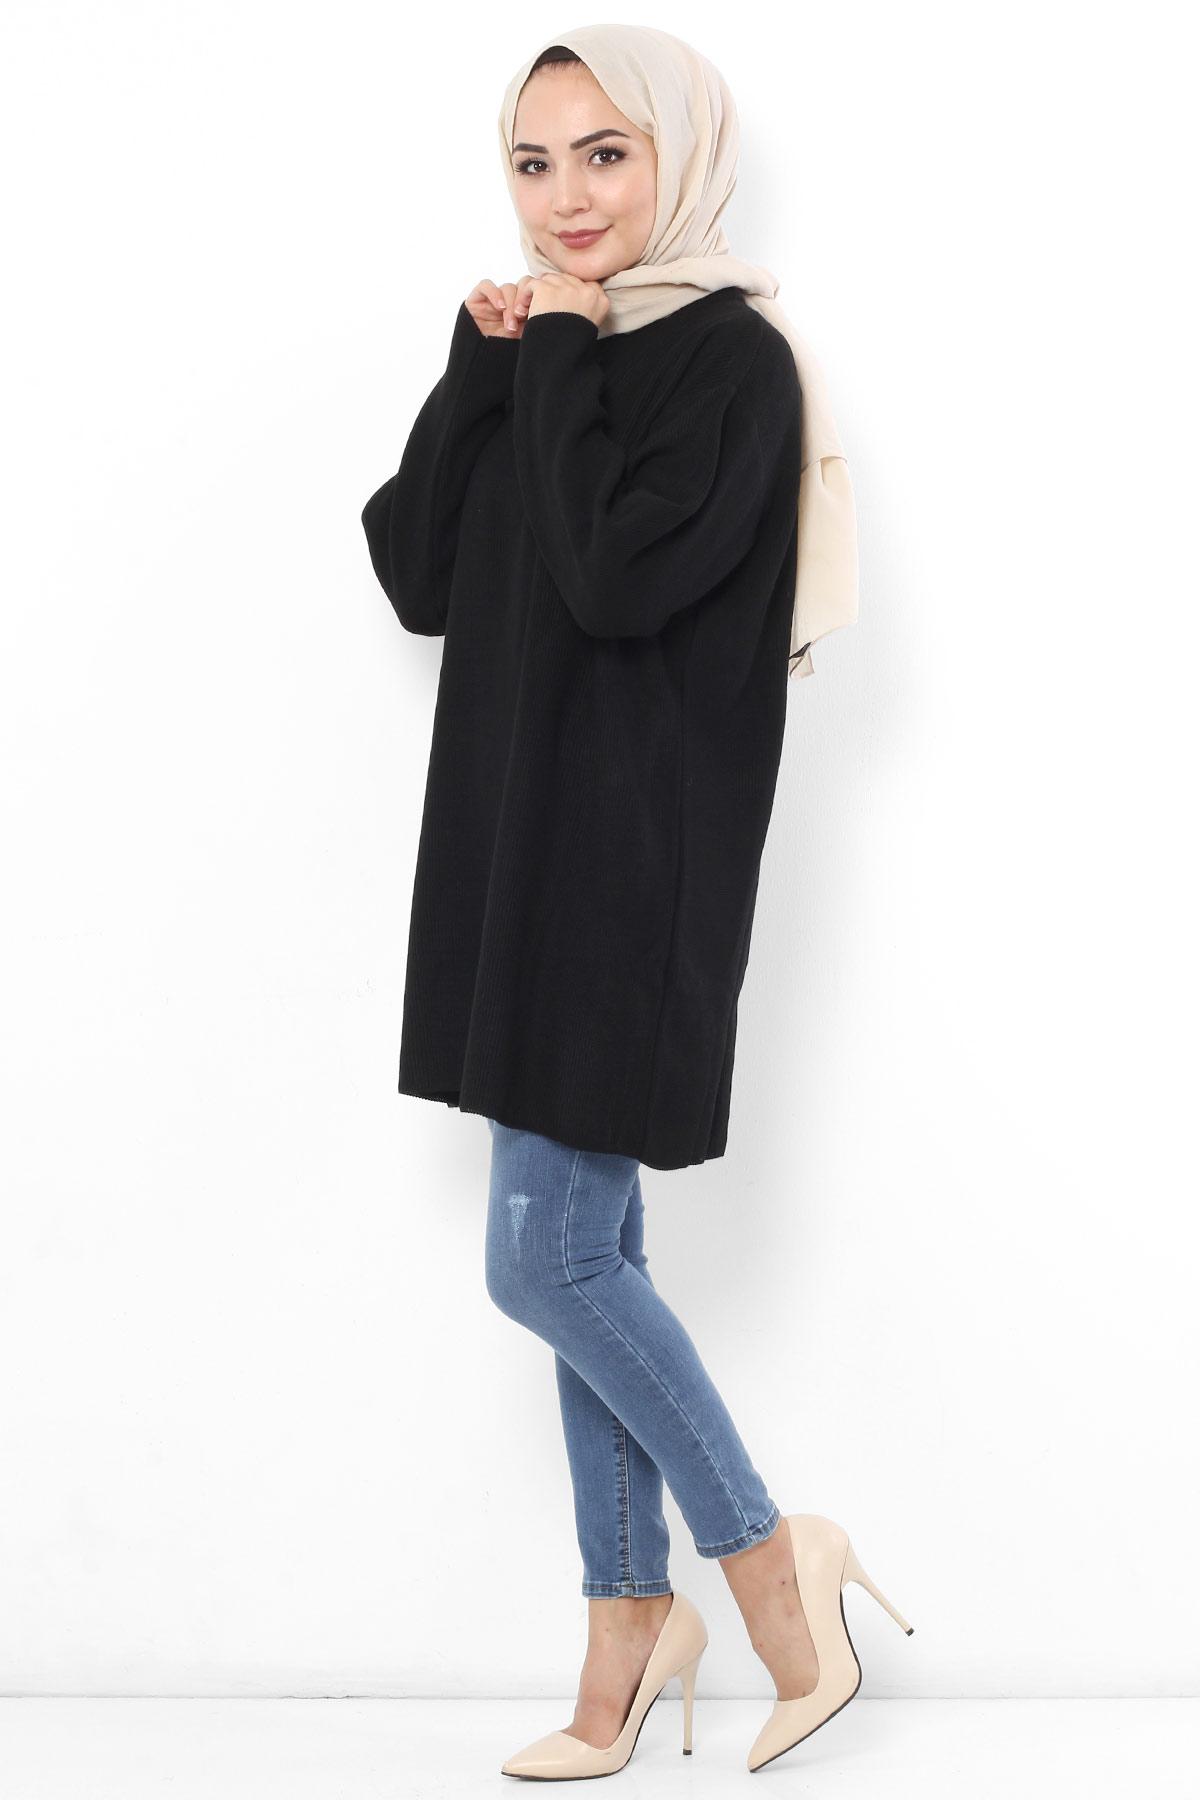 Shabby Tricot Tunic TSD5323 Black